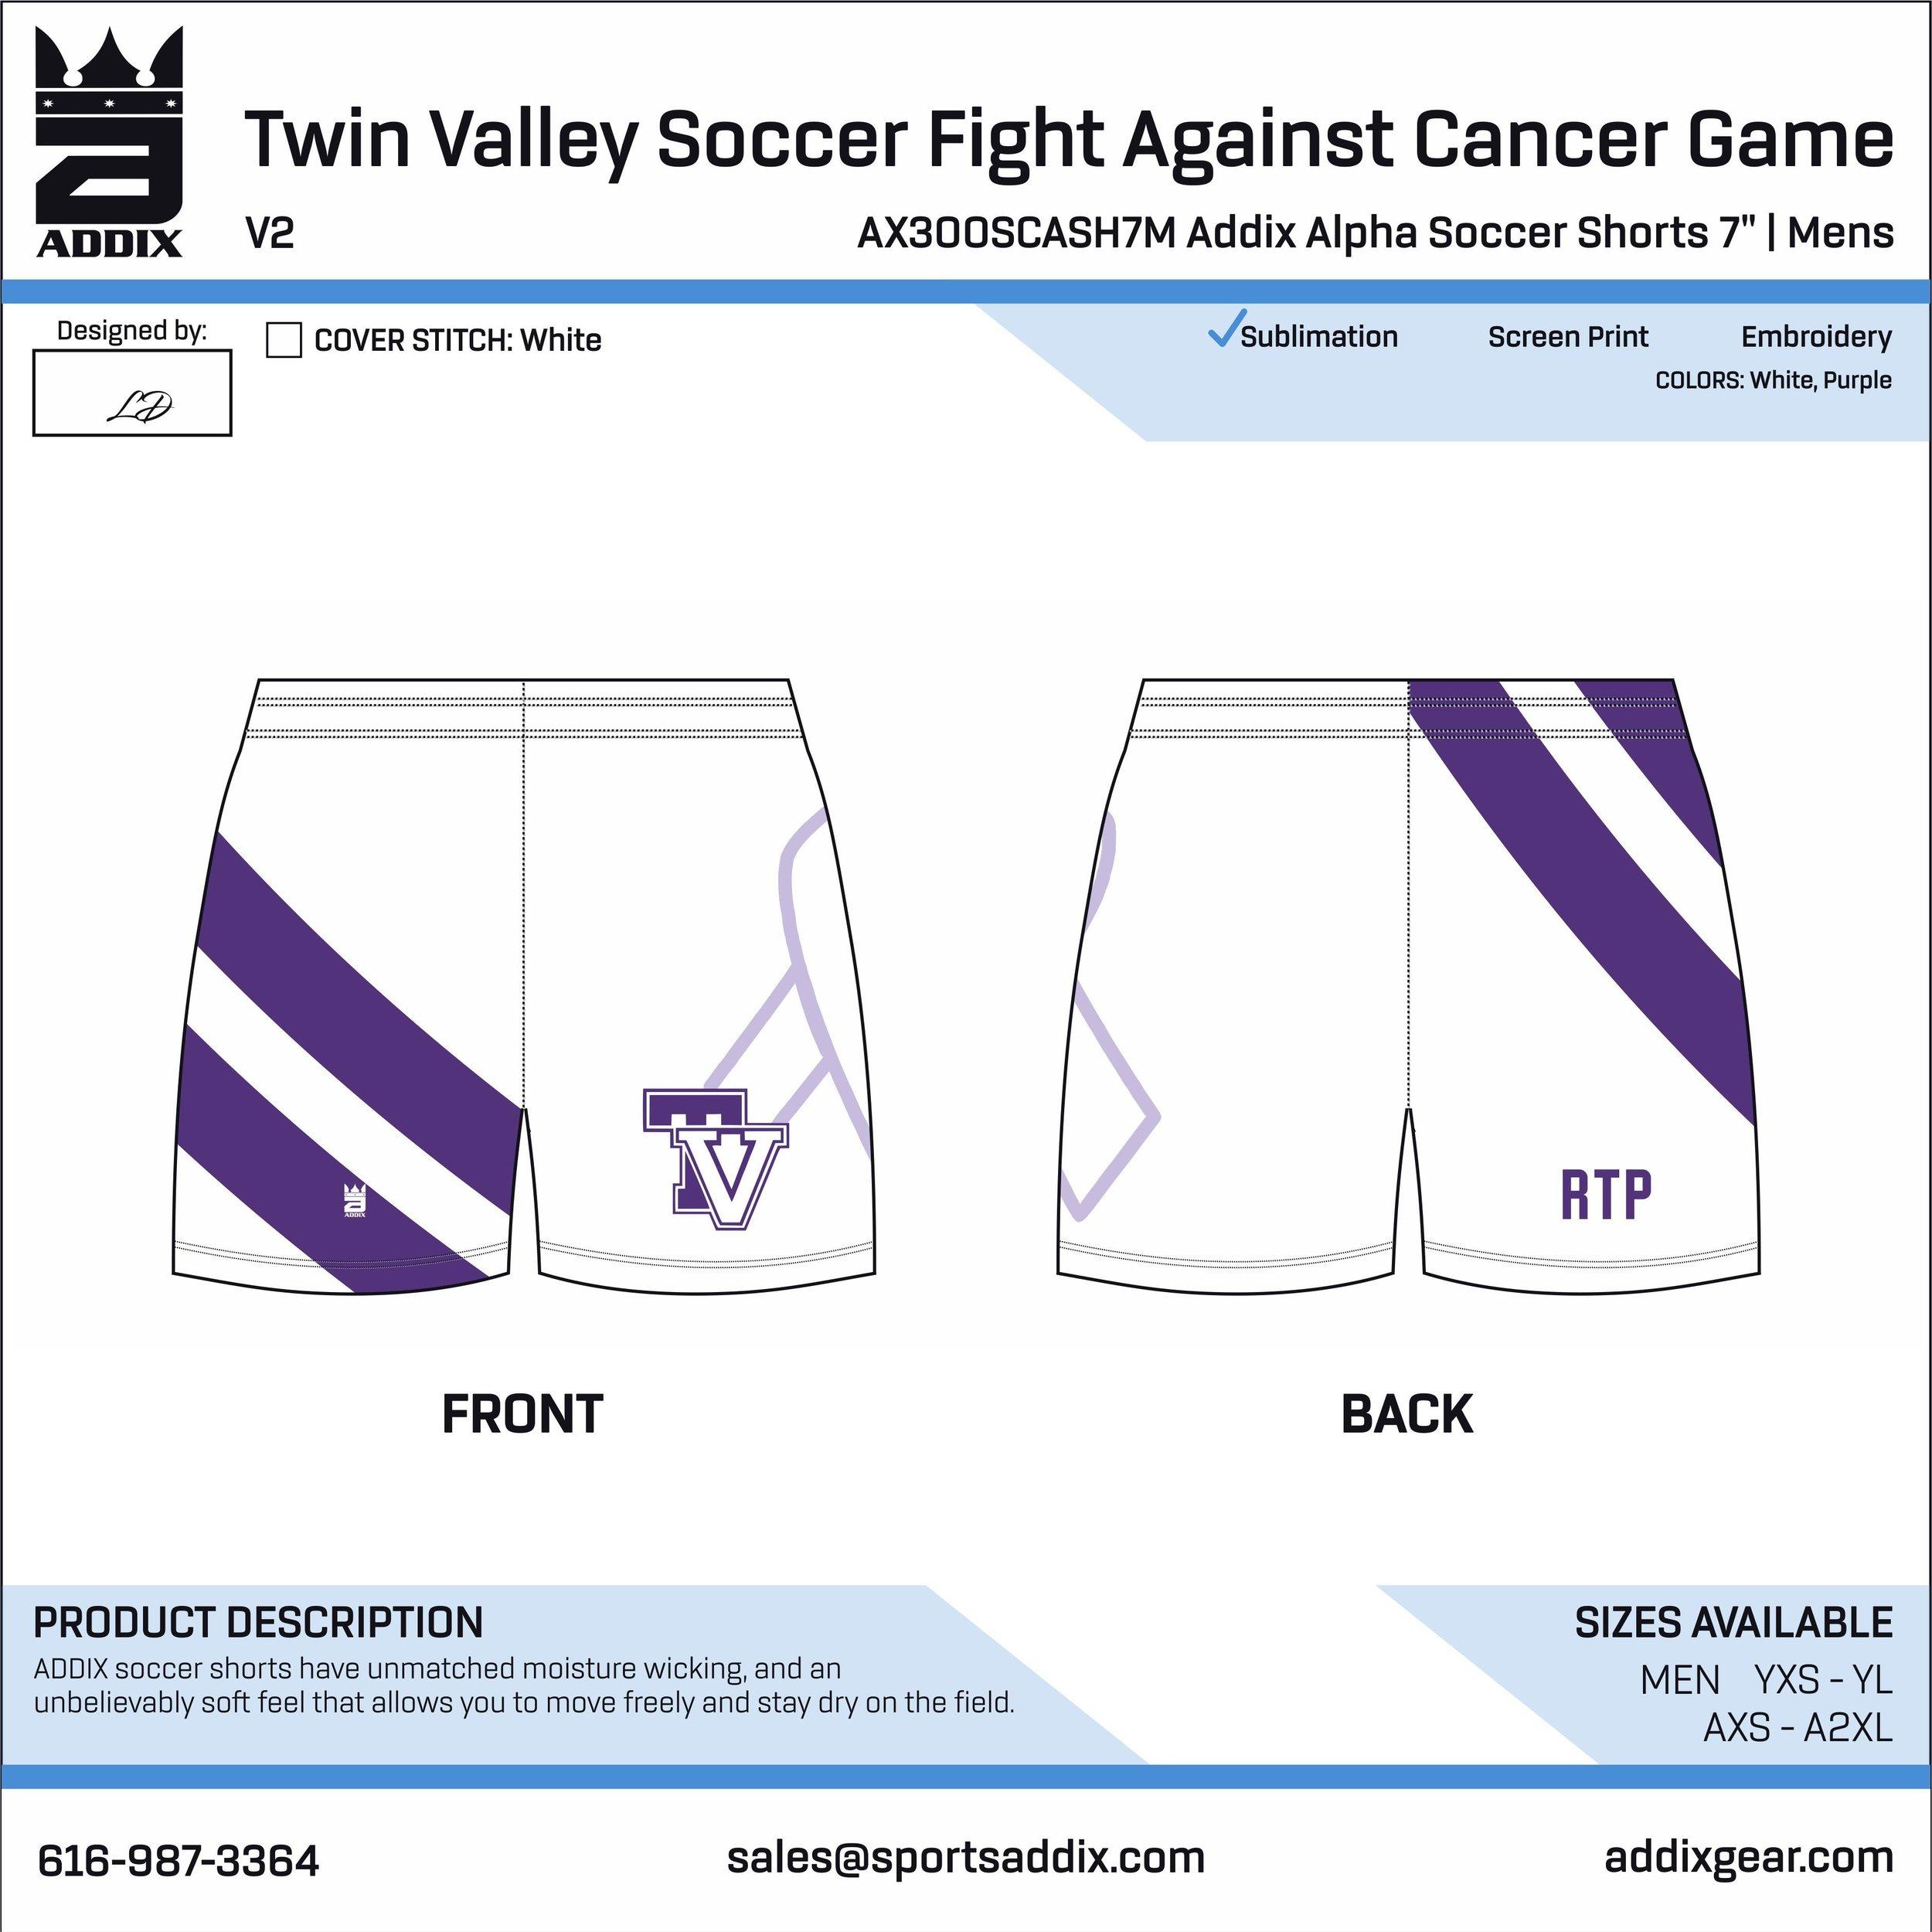 Twin Valley Soccer Fight Against Cancer Game_2019_8-23_LD_SoccerShorts_v2.jpg